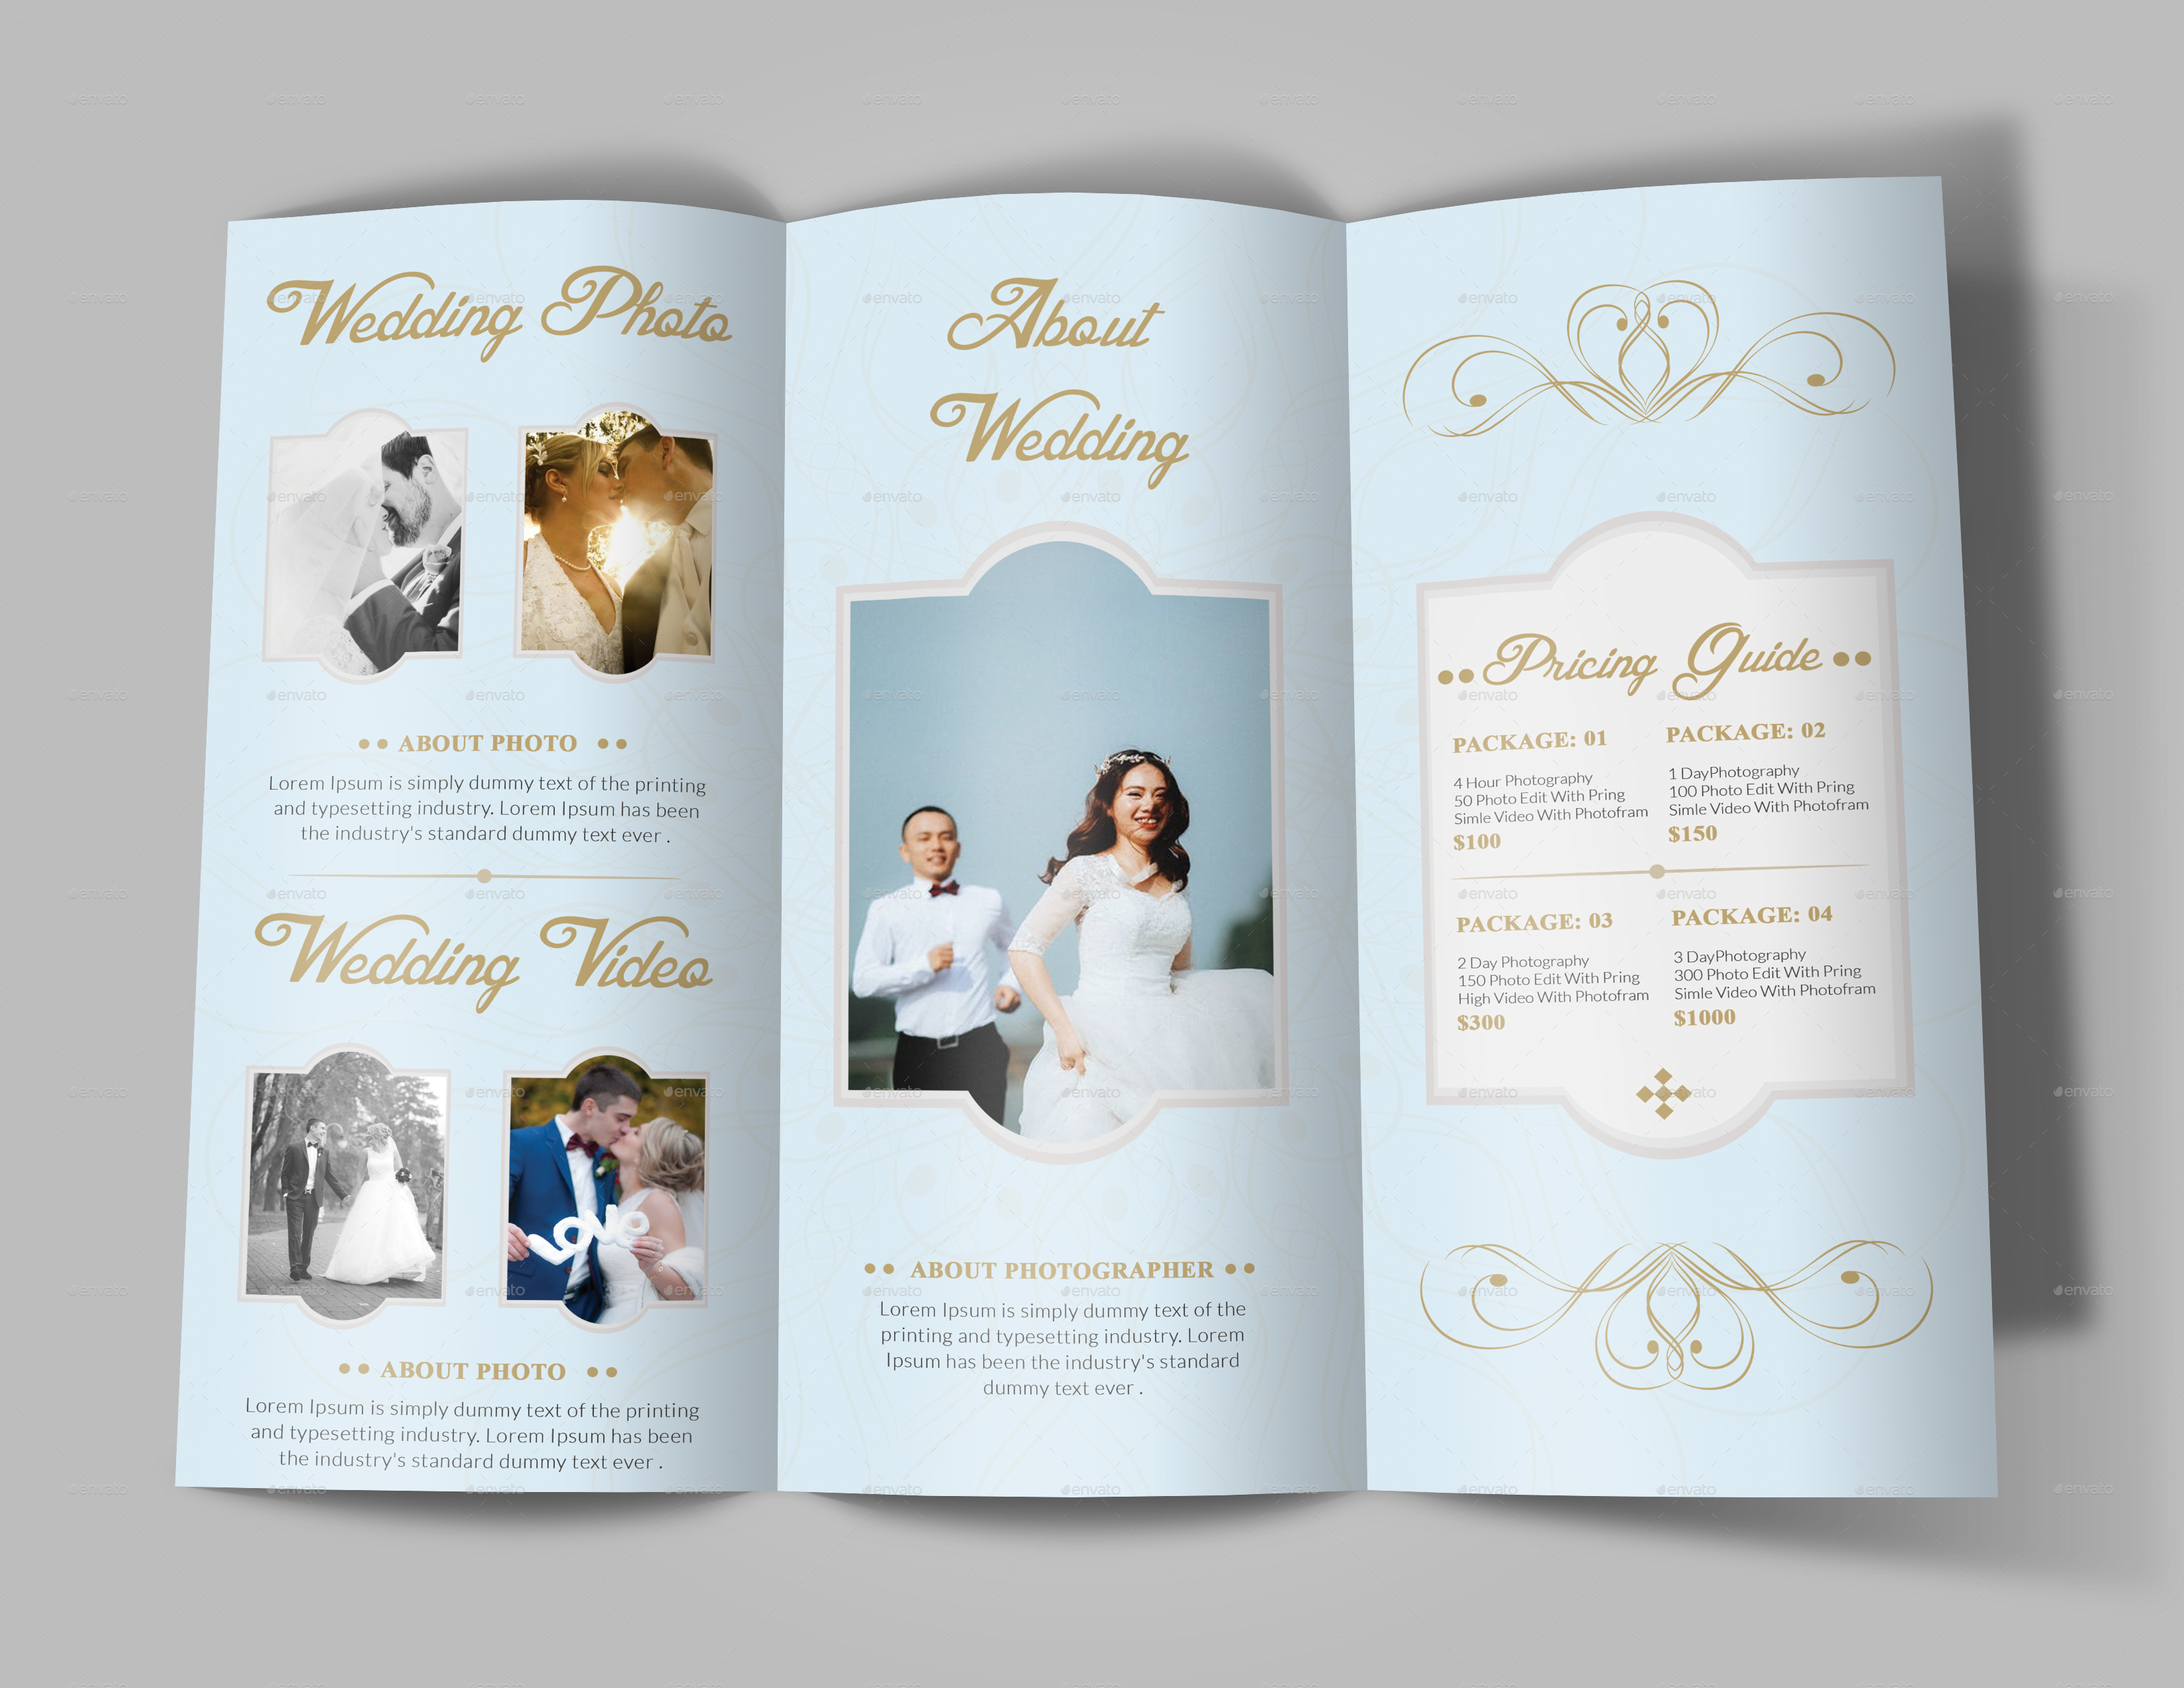 wedding brochure templates - wedding brochure template by designhaunt graphicriver